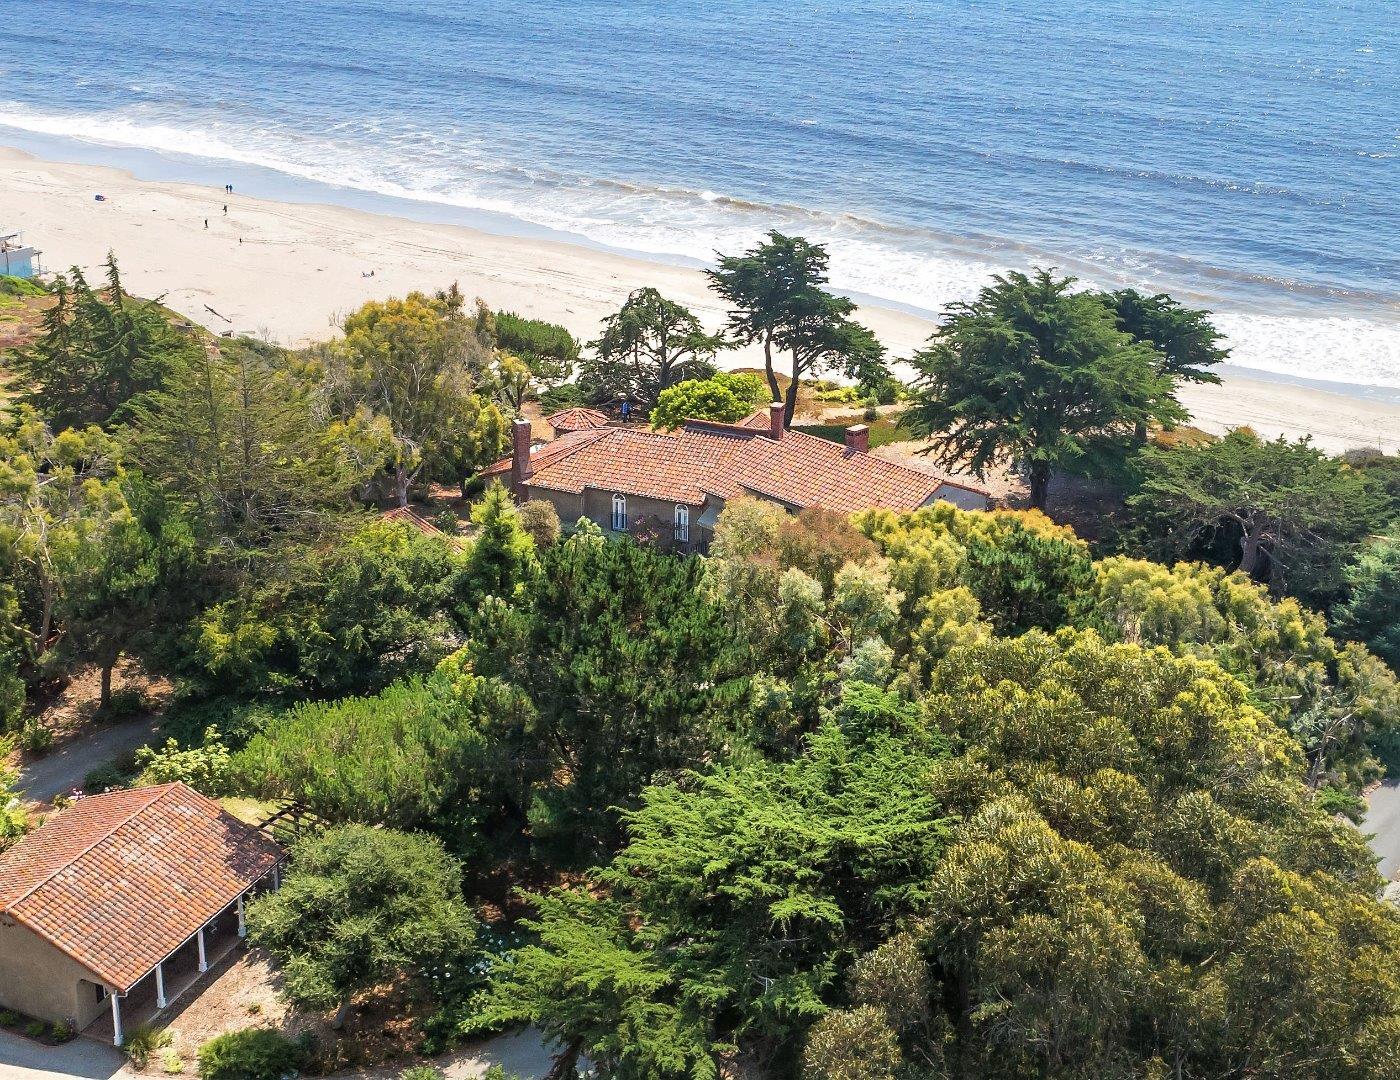 Single Family Home for Sale at 1425 San Andreas Road La Selva Beach, California 95076 United States